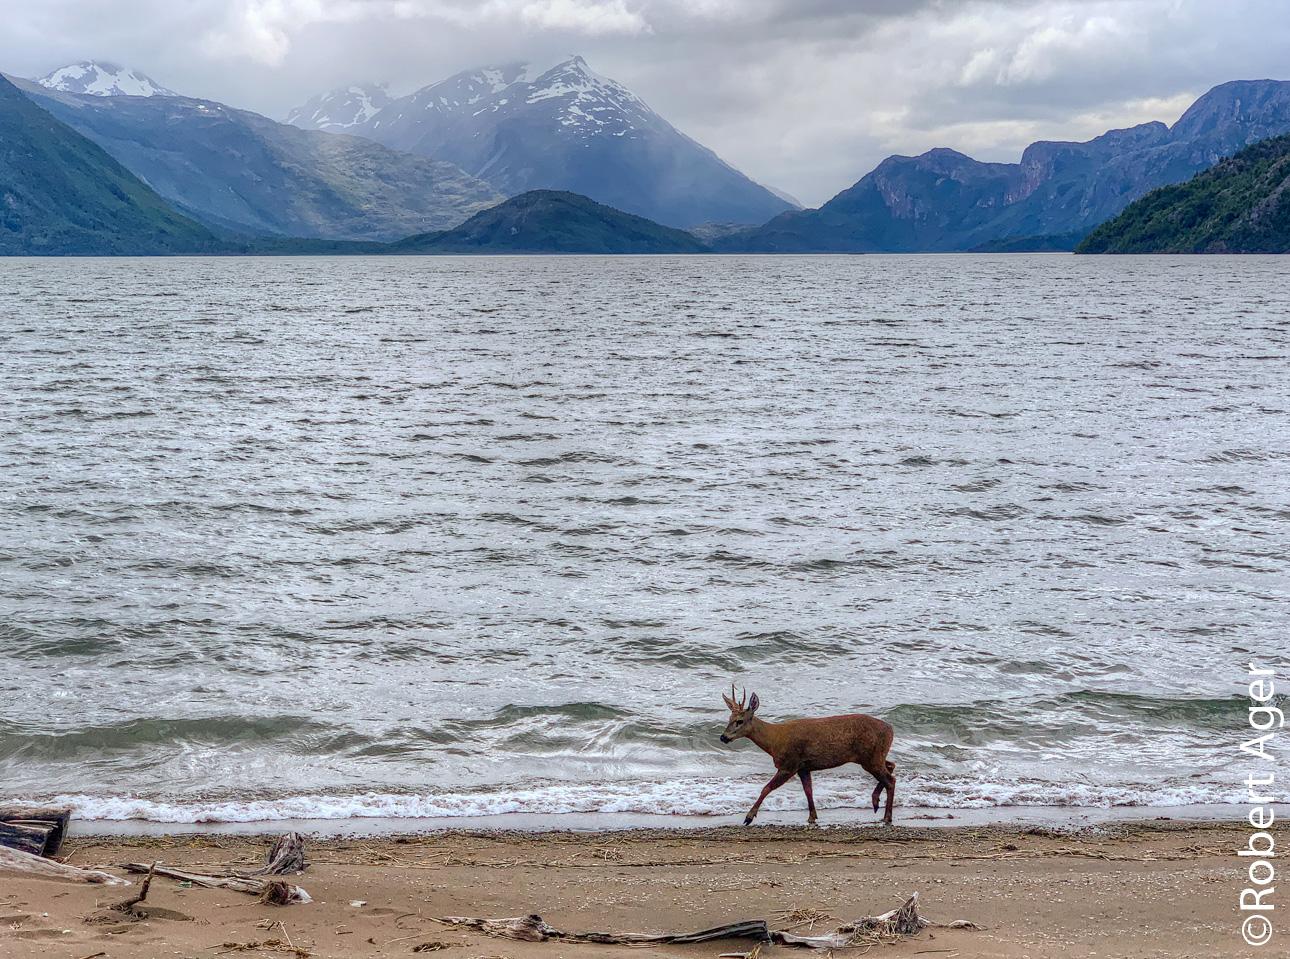 061_Overlander_Gaia_Patagonia